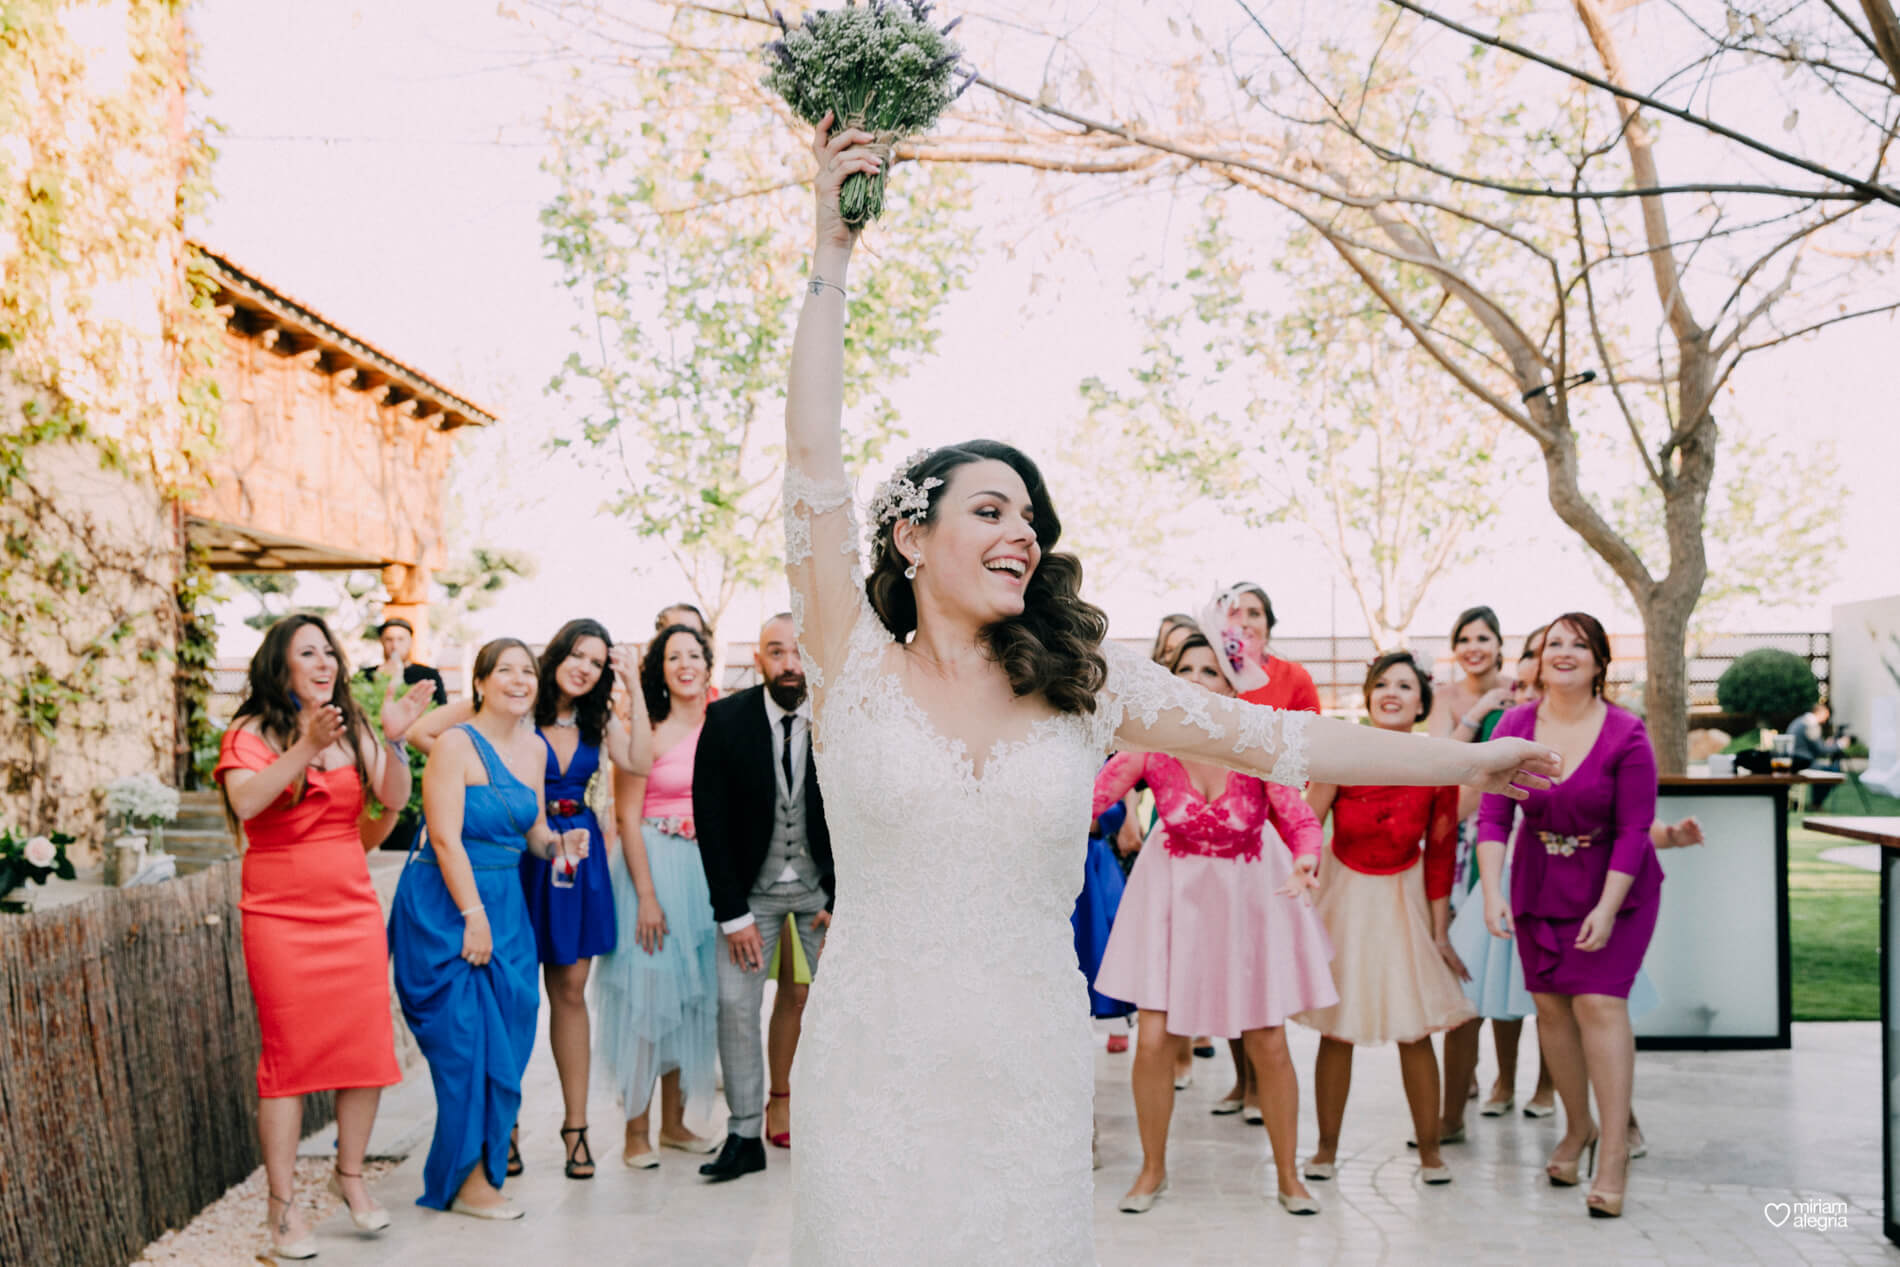 boda-en-finca-jurosa-miriam-alegria-134